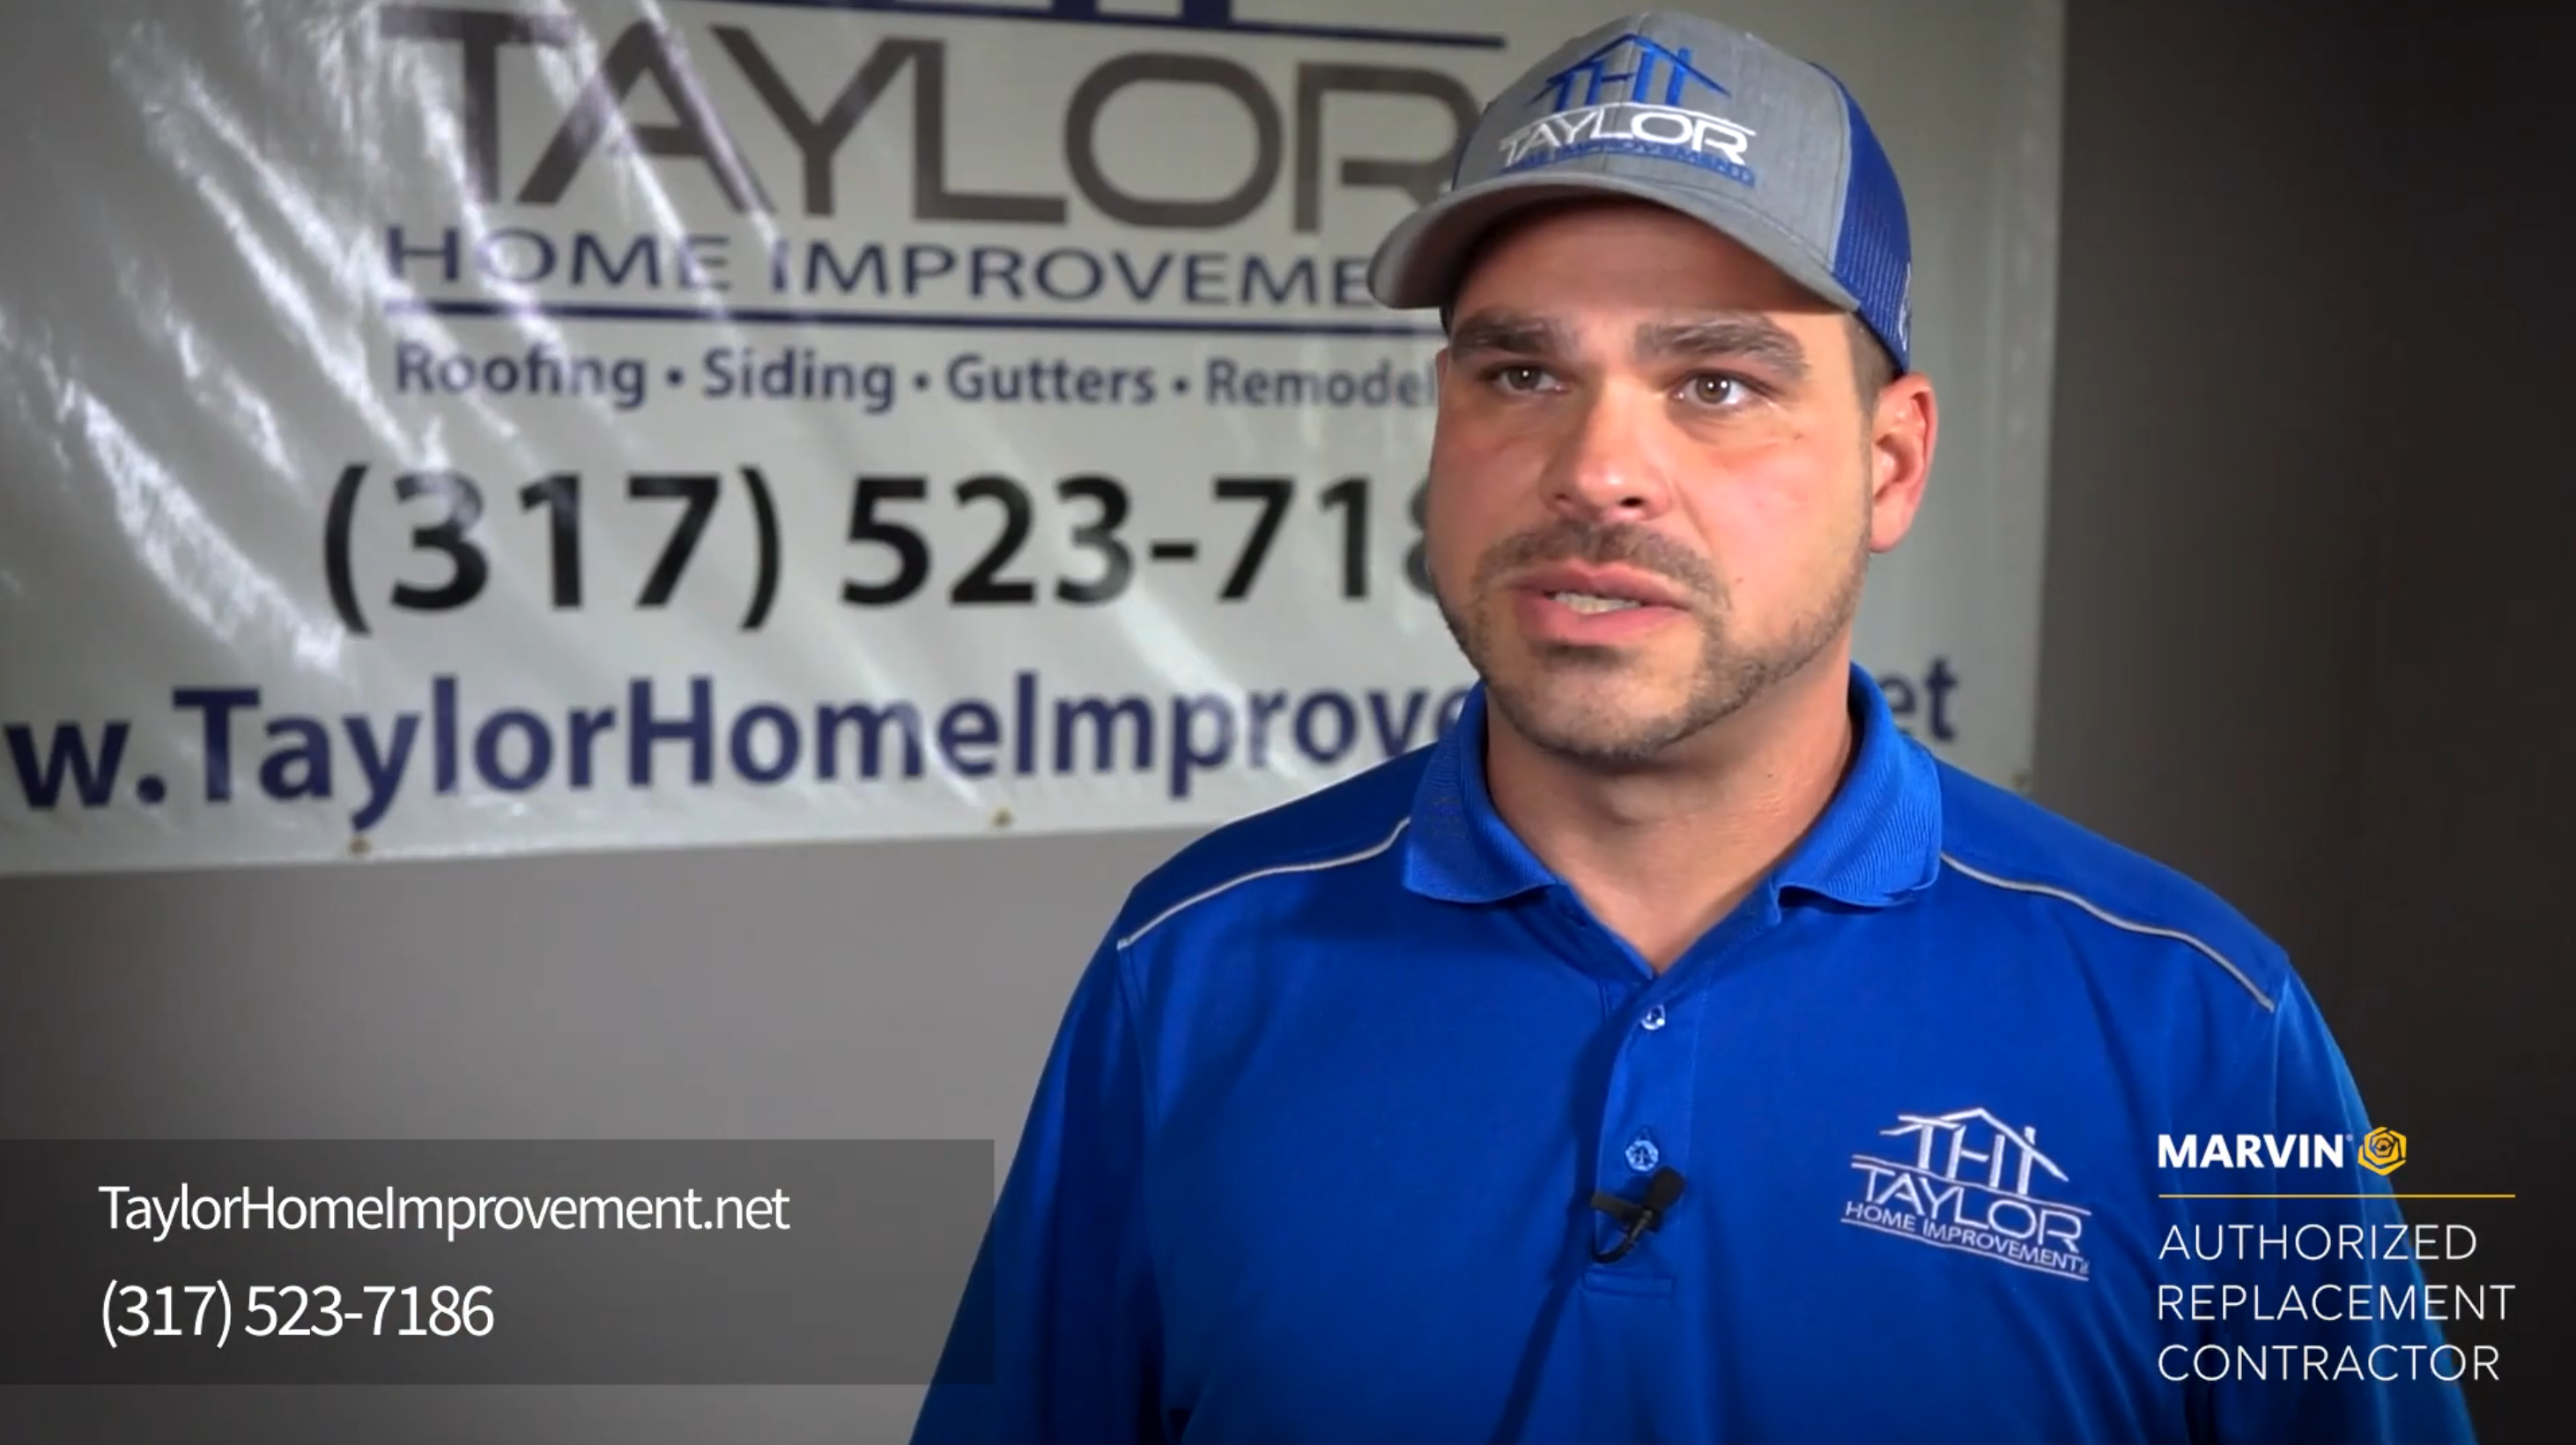 Taylor Home Improvement